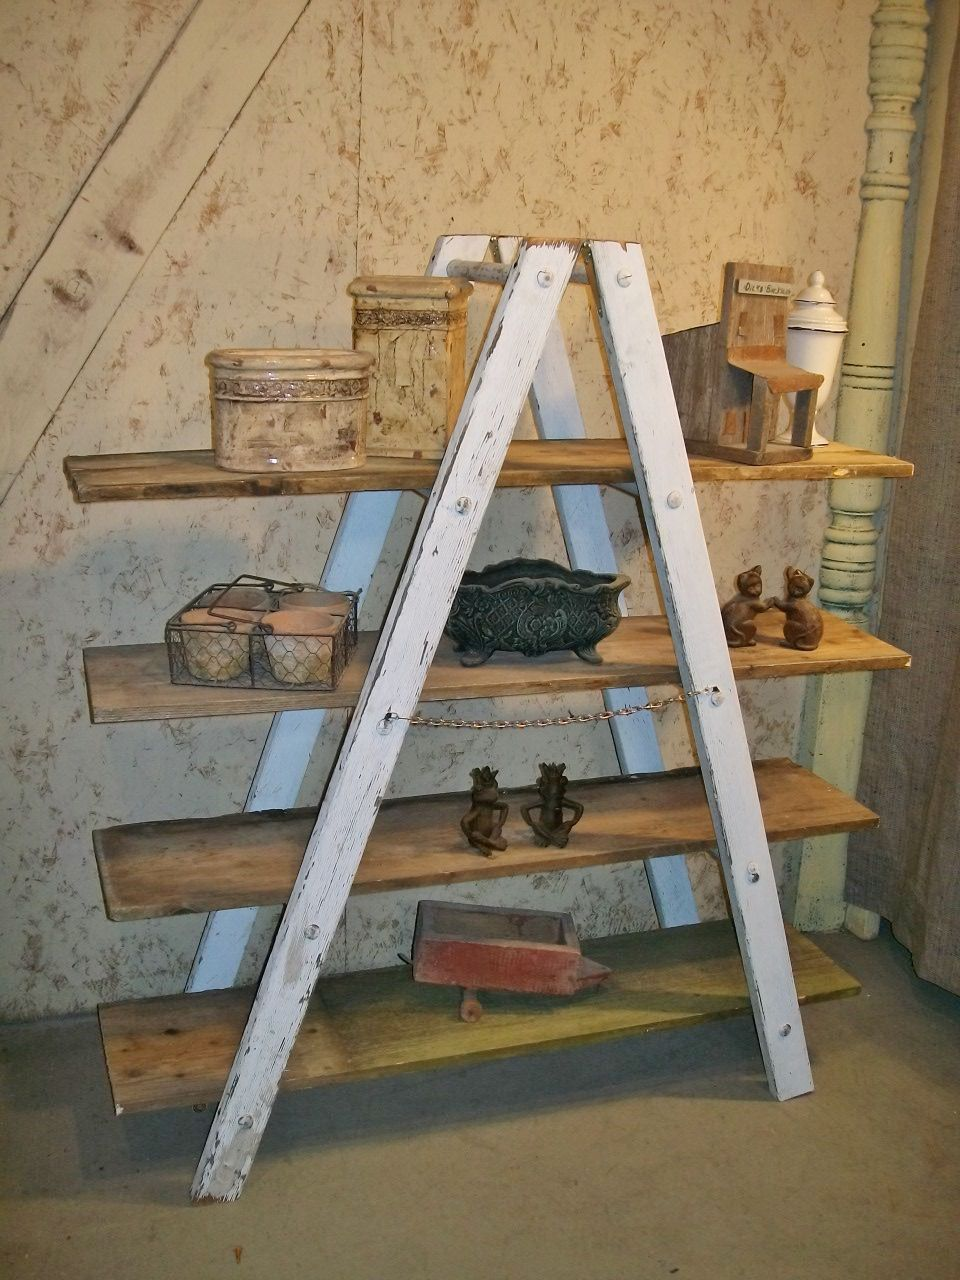 Shaped Wooden Ladder Rustic Shelving 5 Rung Wooden Ladder Wood Ladder Decor Old Wooden Ladders